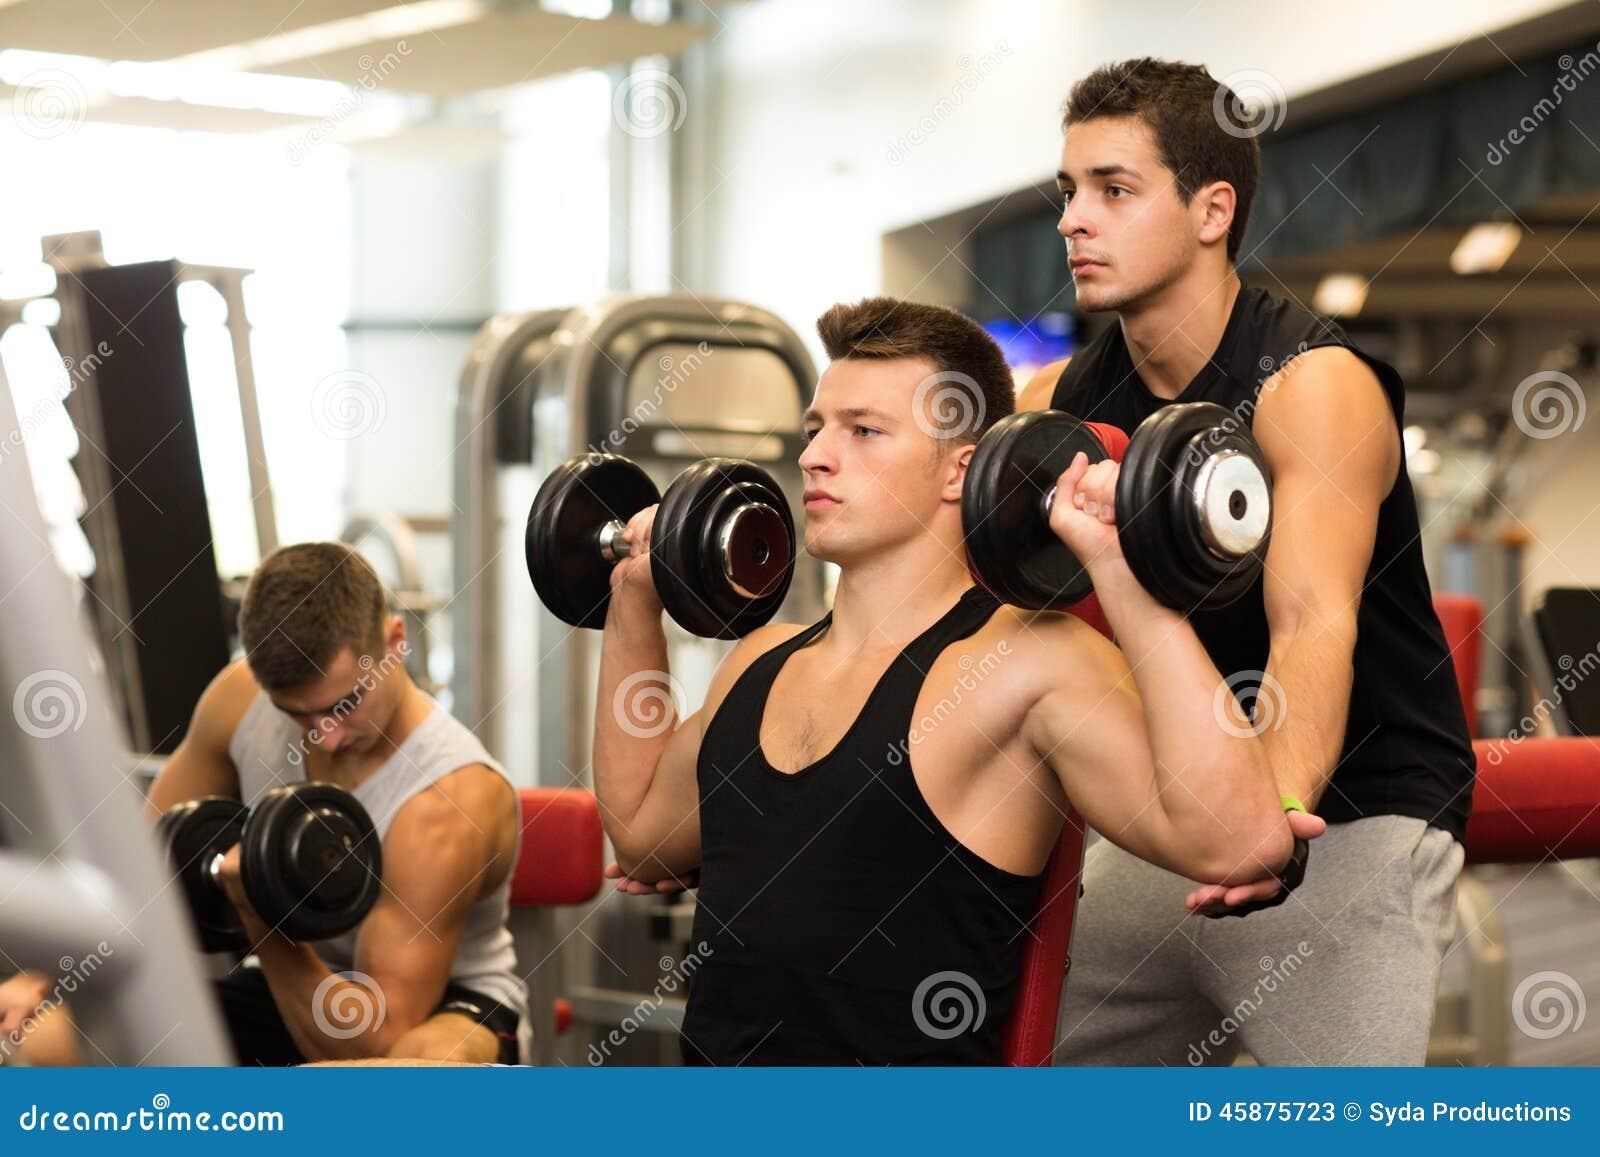 Grupo de hombres con pesas de gimnasia en gimnasio imagen - Imagenes de gimnasio ...